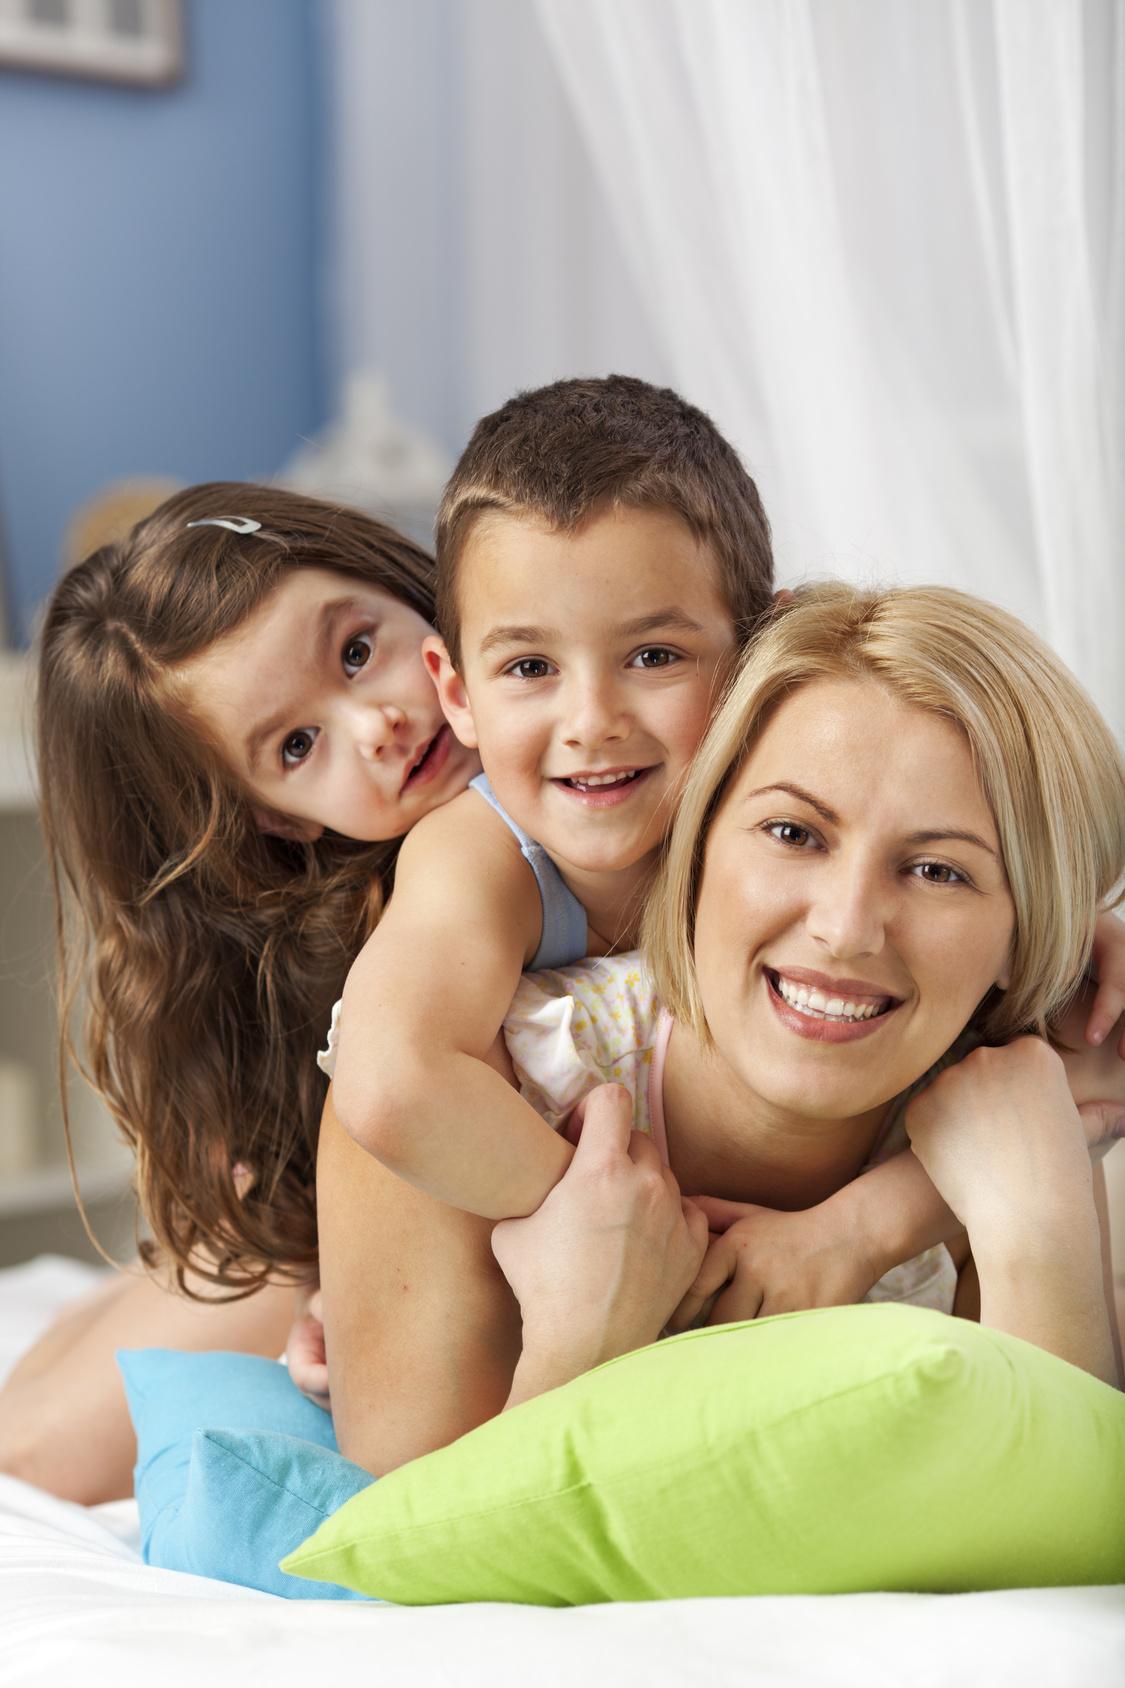 kids and mum in pajamas cuddling in bed | sense organics